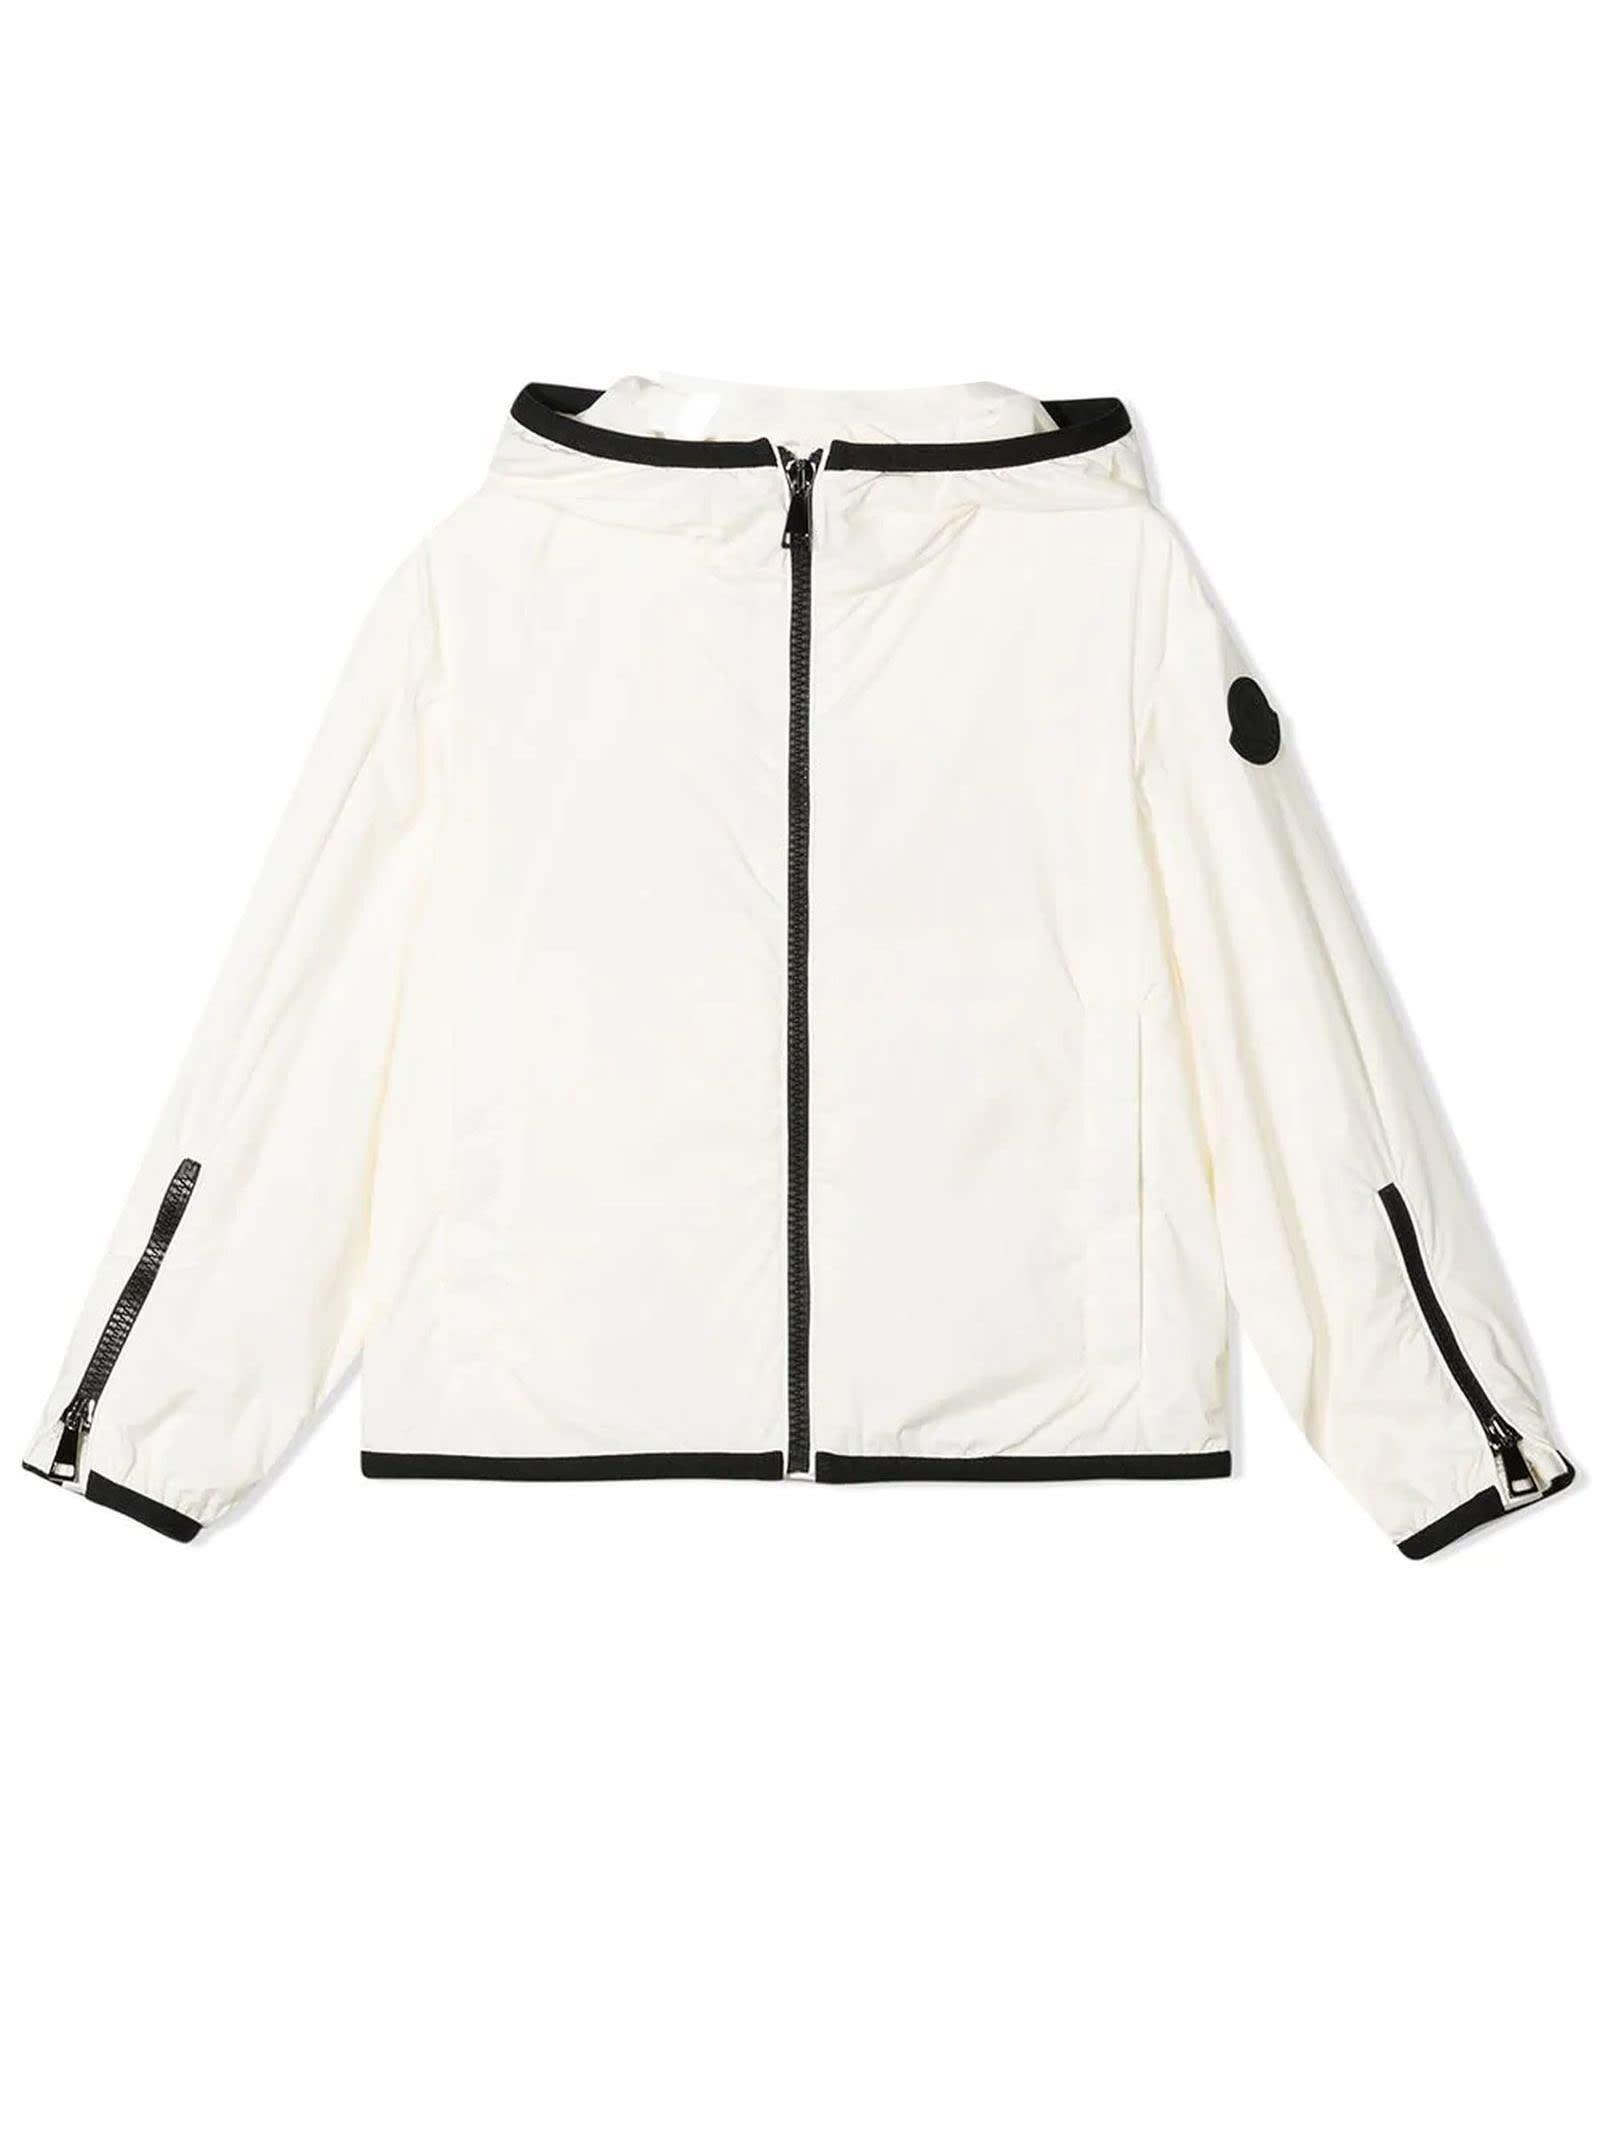 Moncler White Hooded Jacket